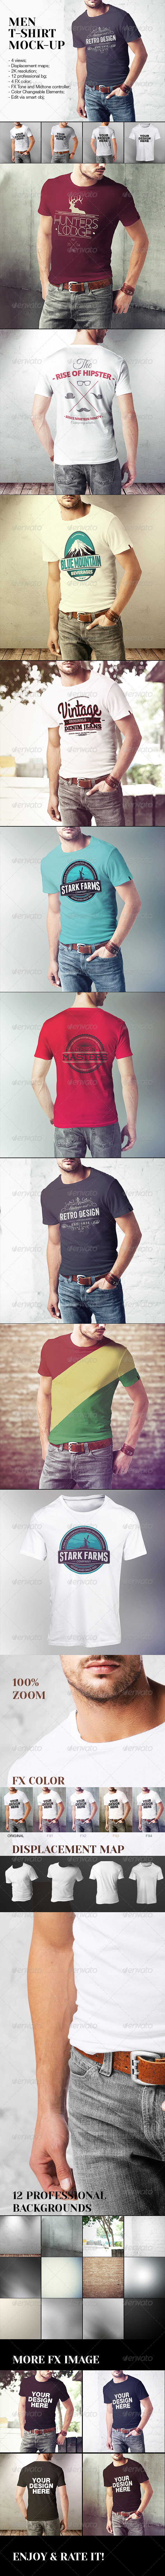 Graphicriver | Men T-Shirt Mock-Up Free Download free download Graphicriver | Men T-Shirt Mock-Up Free Download nulled Graphicriver | Men T-Shirt Mock-Up Free Download